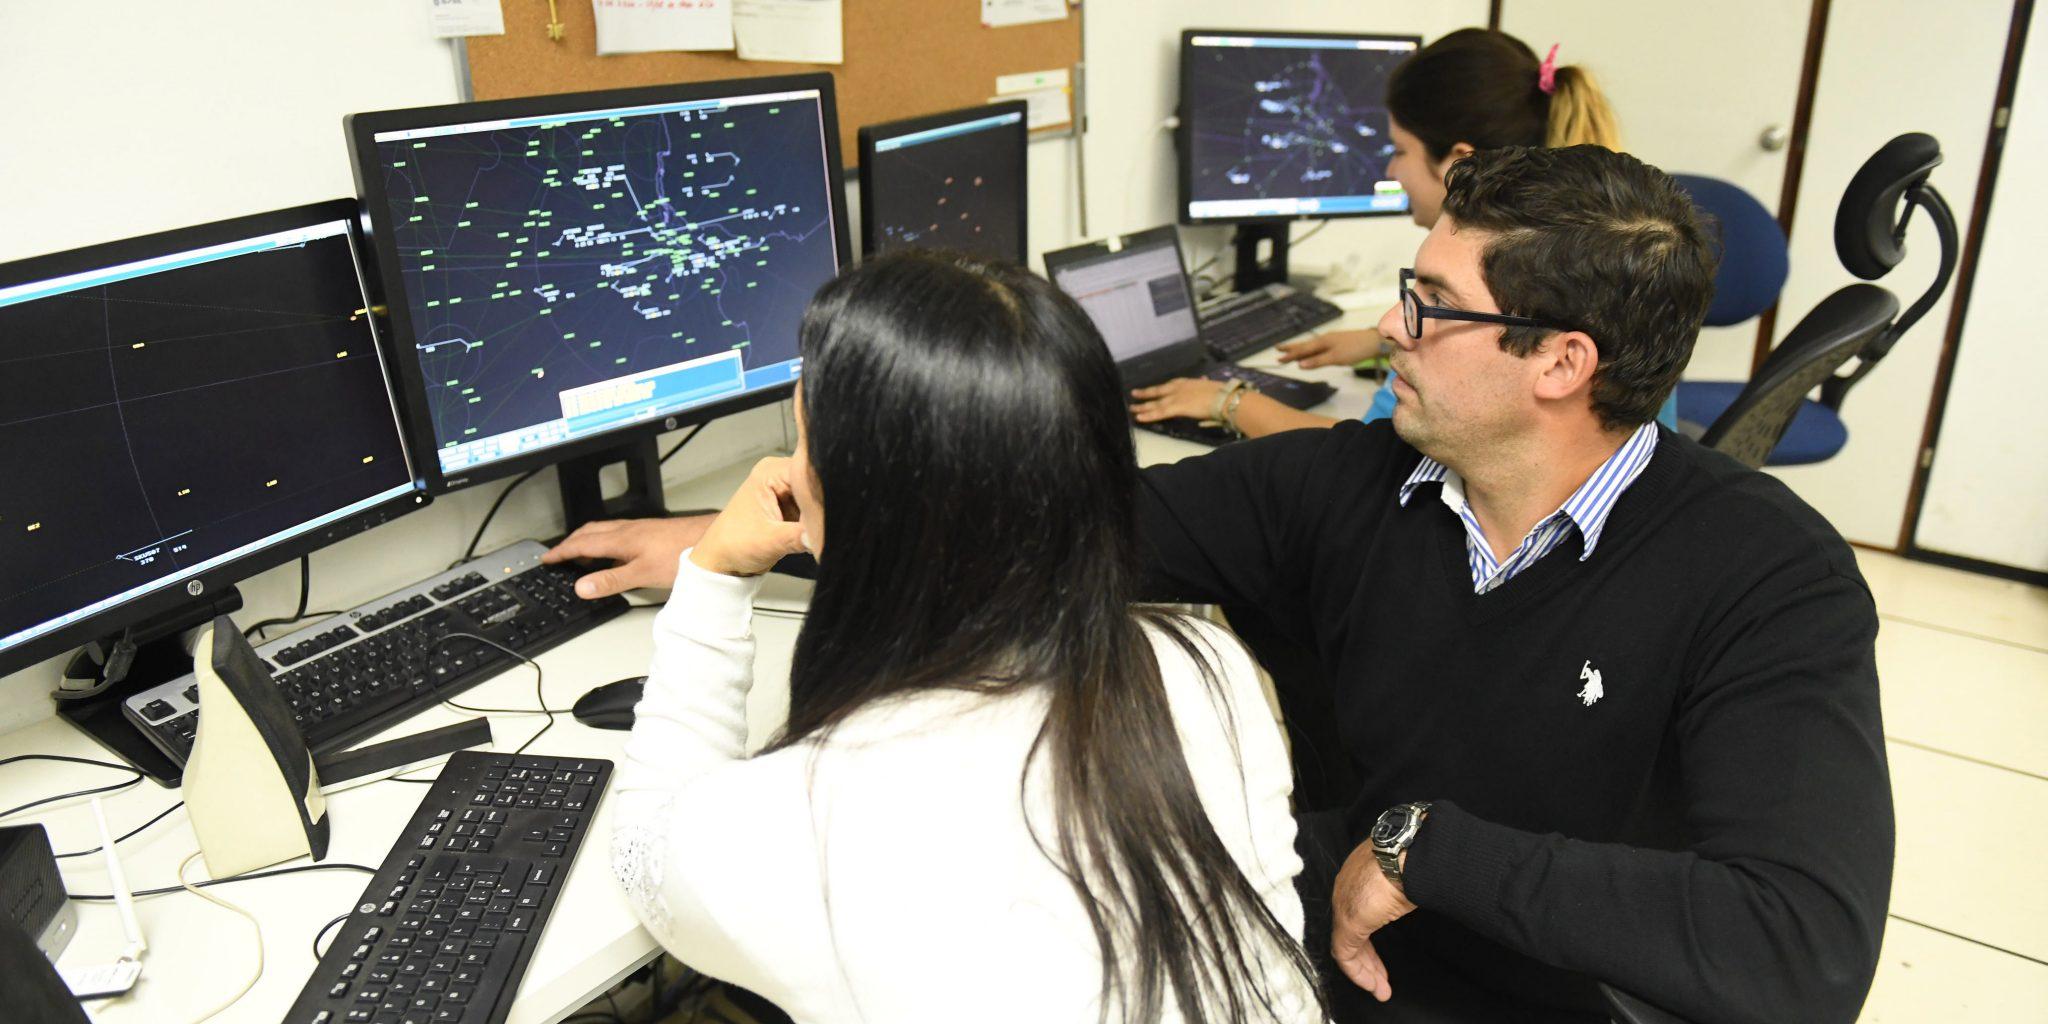 Argentina: El servicio ATFM de EANA cumple un año